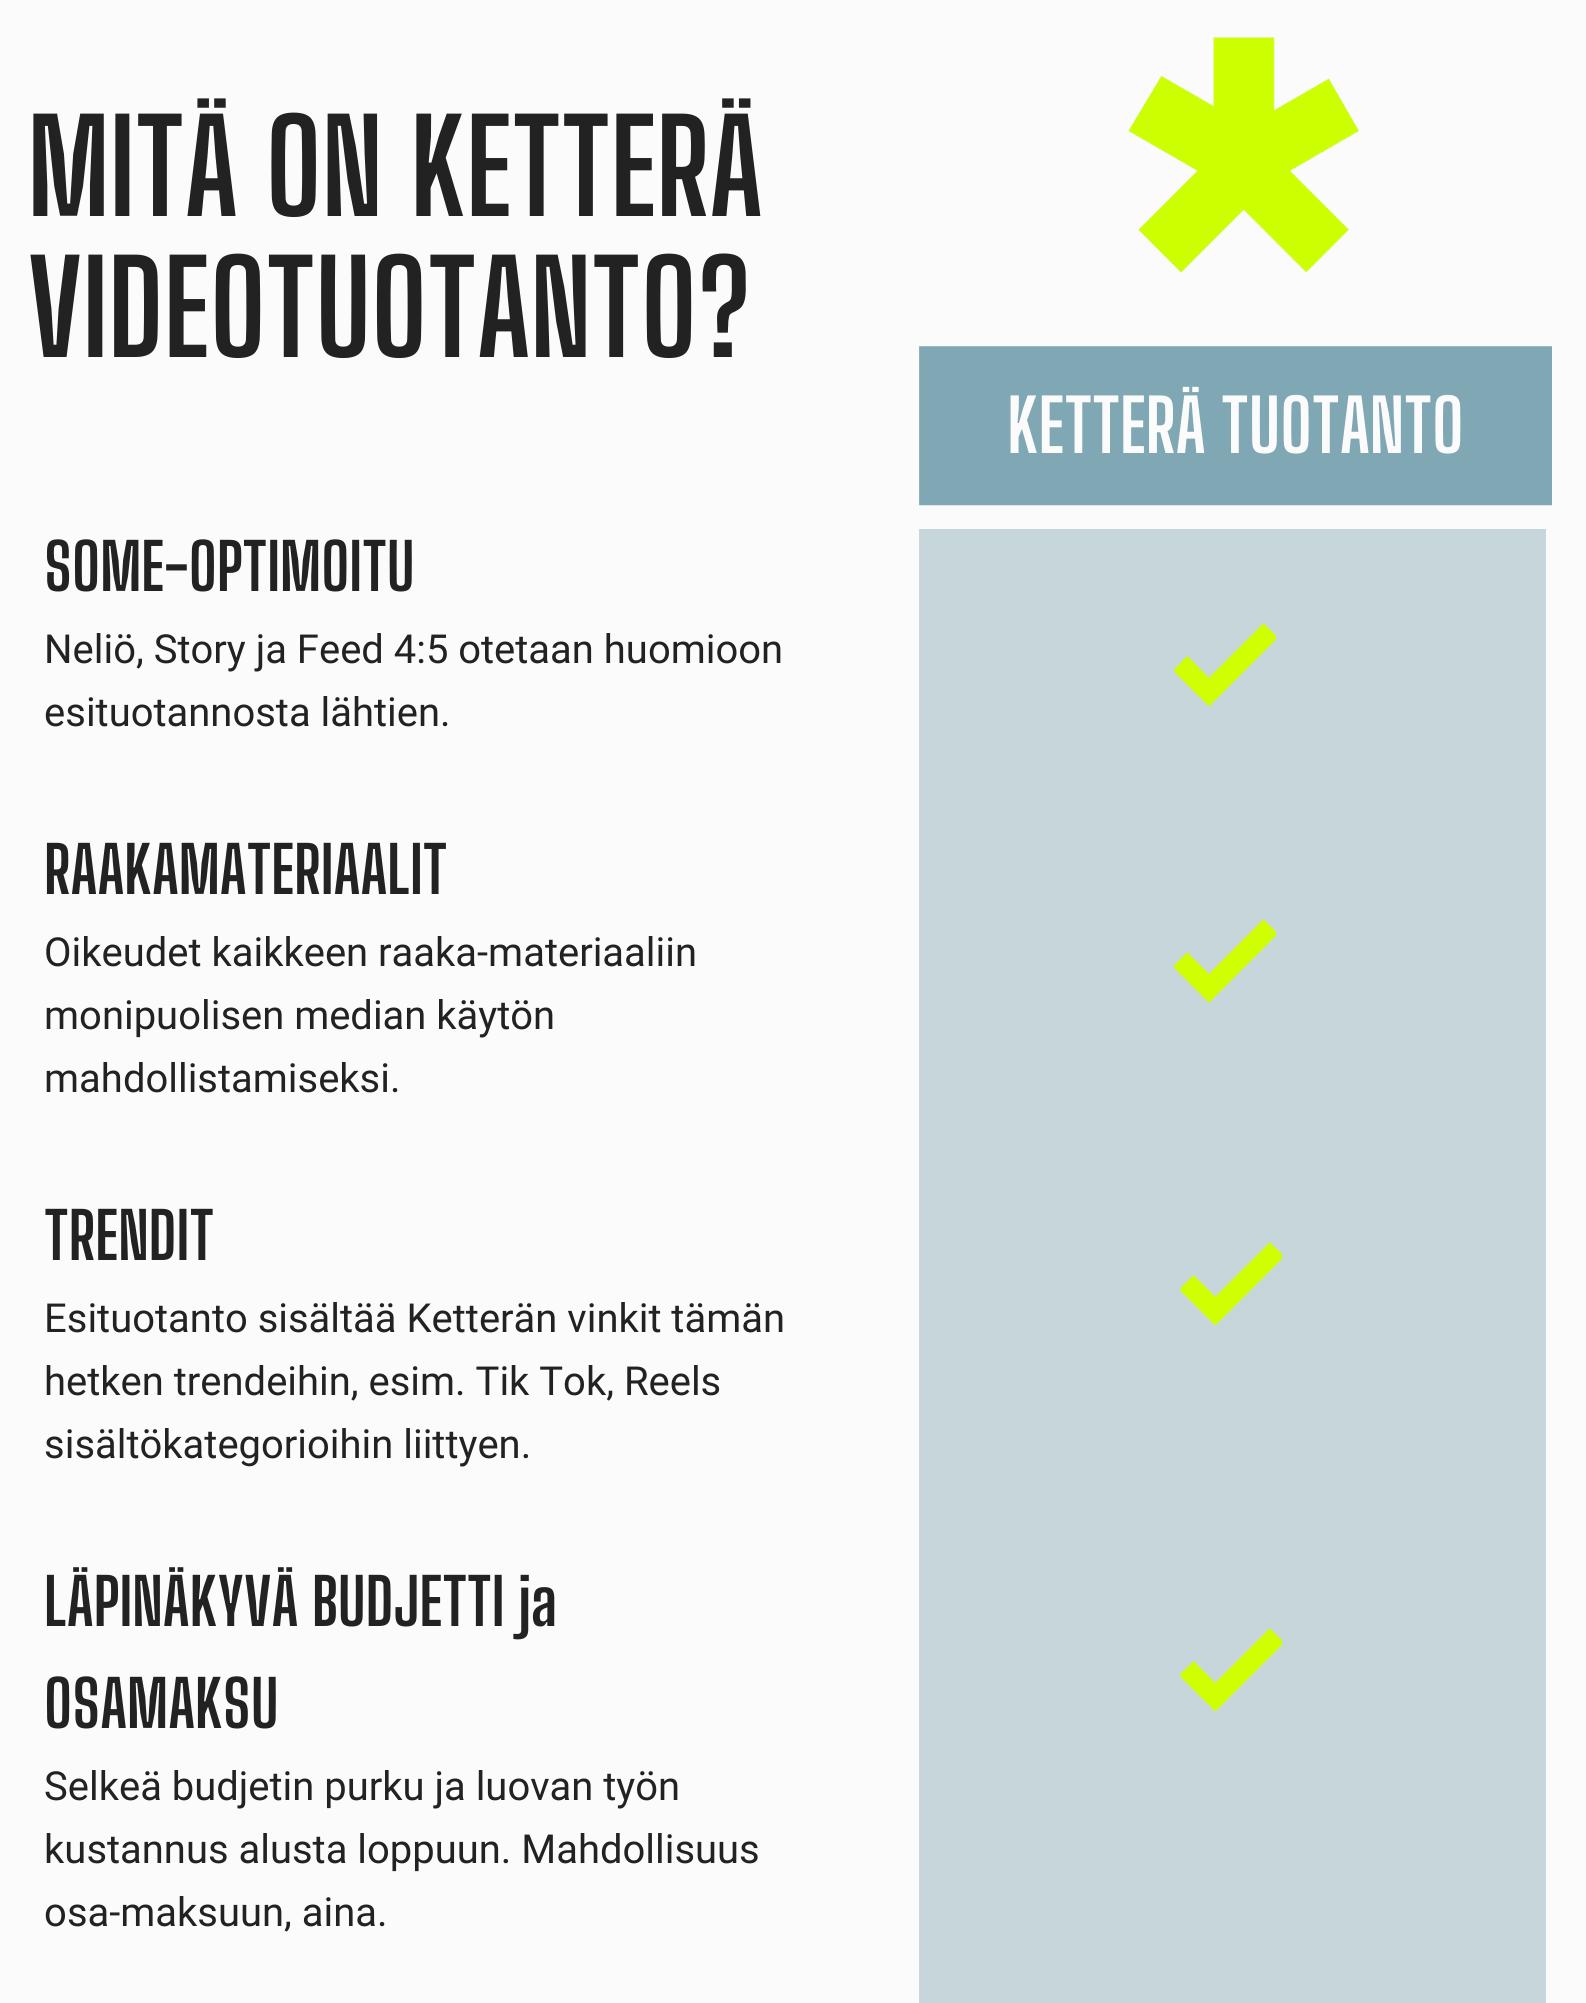 Videotuotanto Helsinki, Tampere, Turku